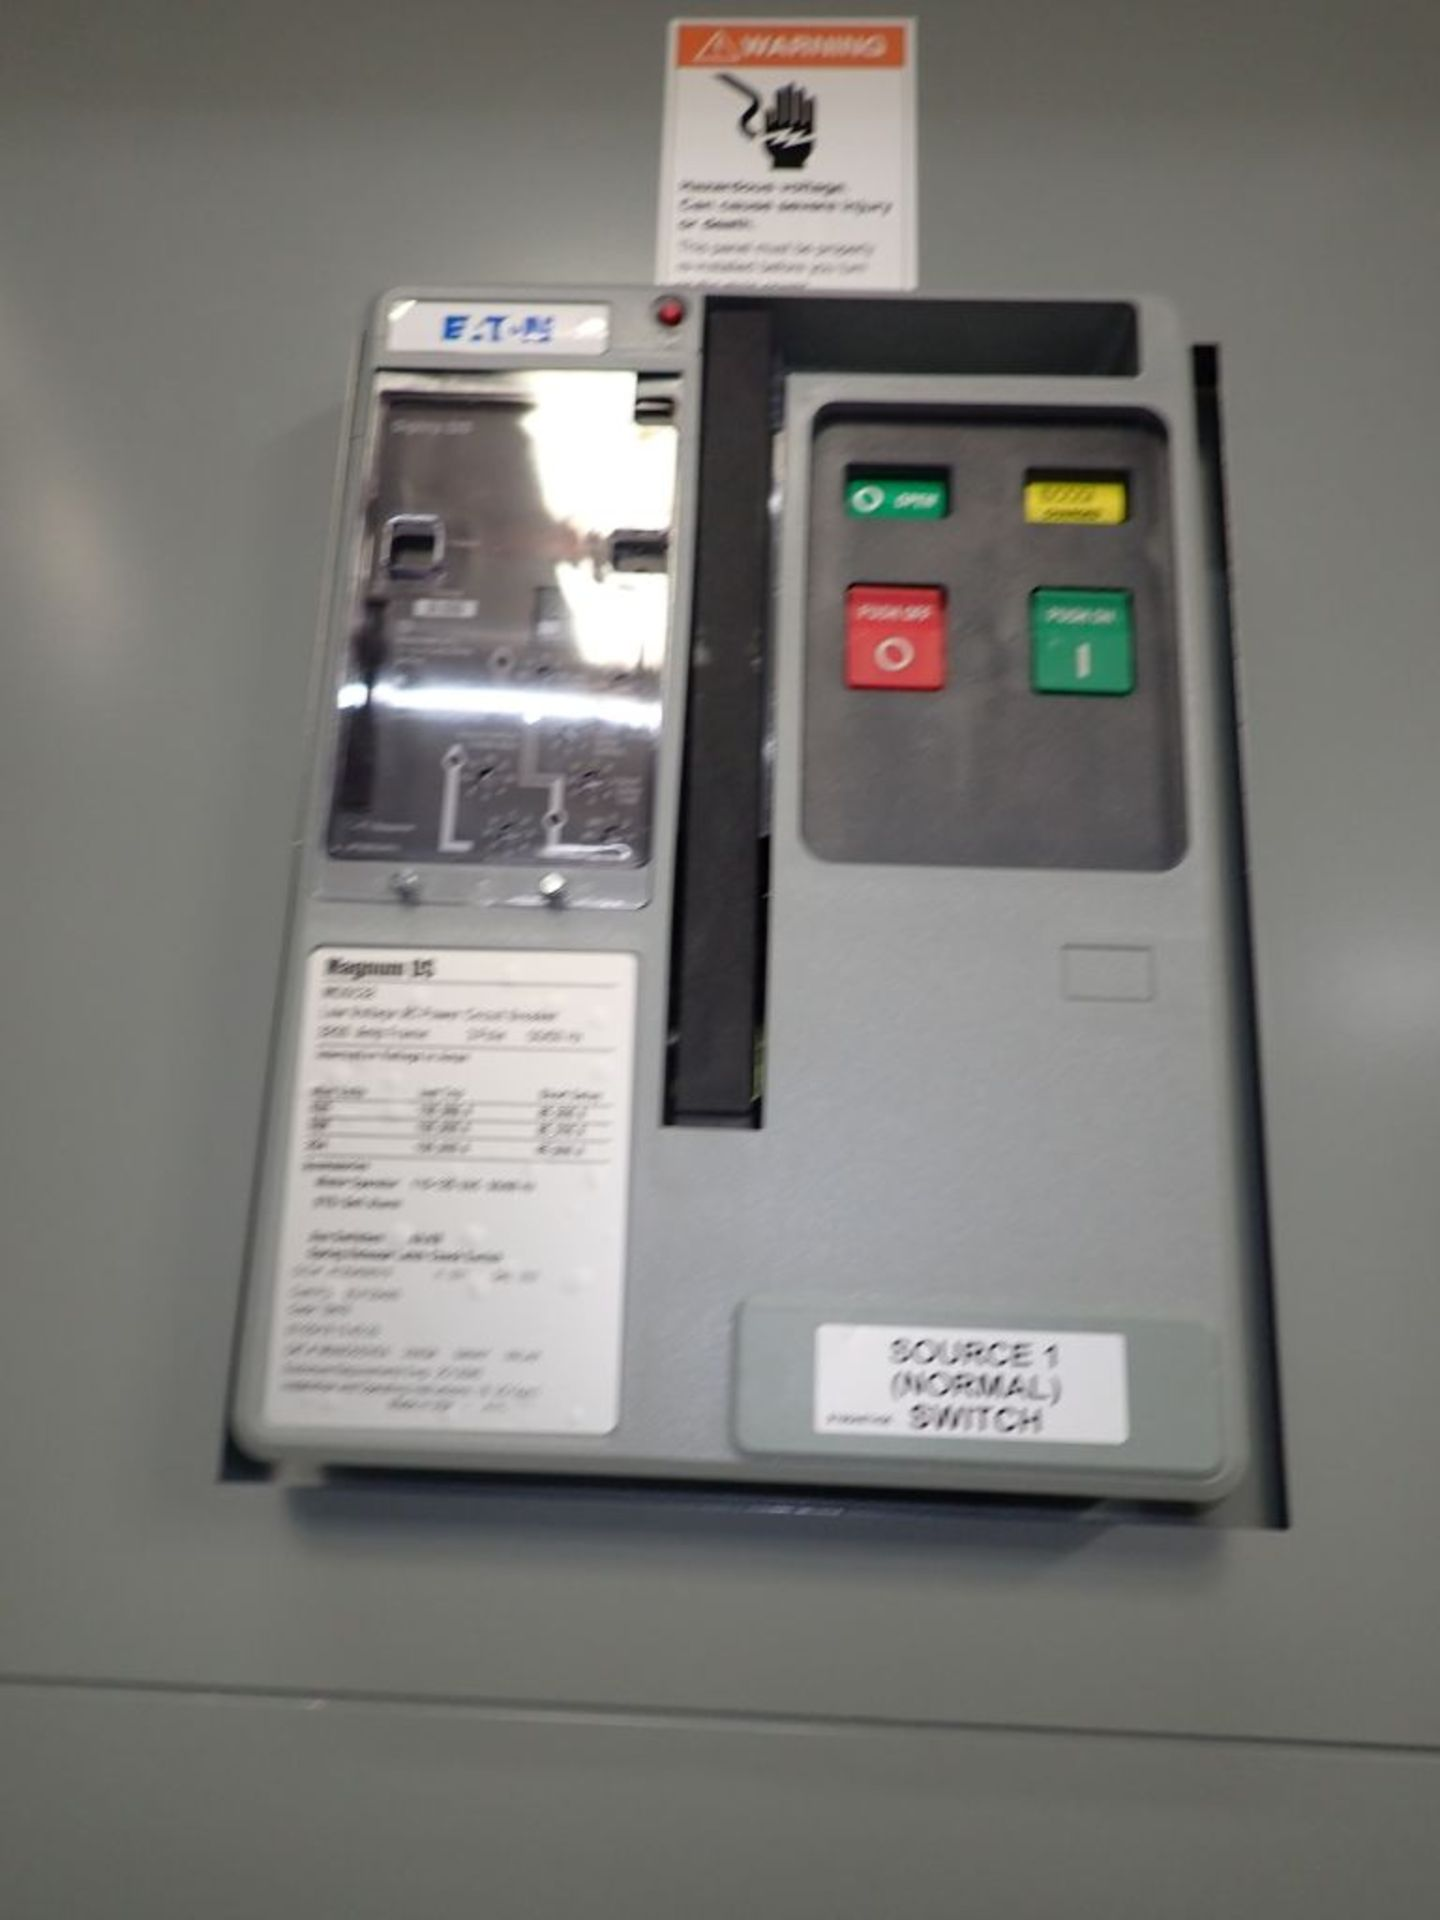 Eaton Transfer Switch | Cat No. ATV9MGB32500XSU; 480V; 3 PH; 2500A; (2) Eaton Magnum DS Circuit - Image 8 of 50